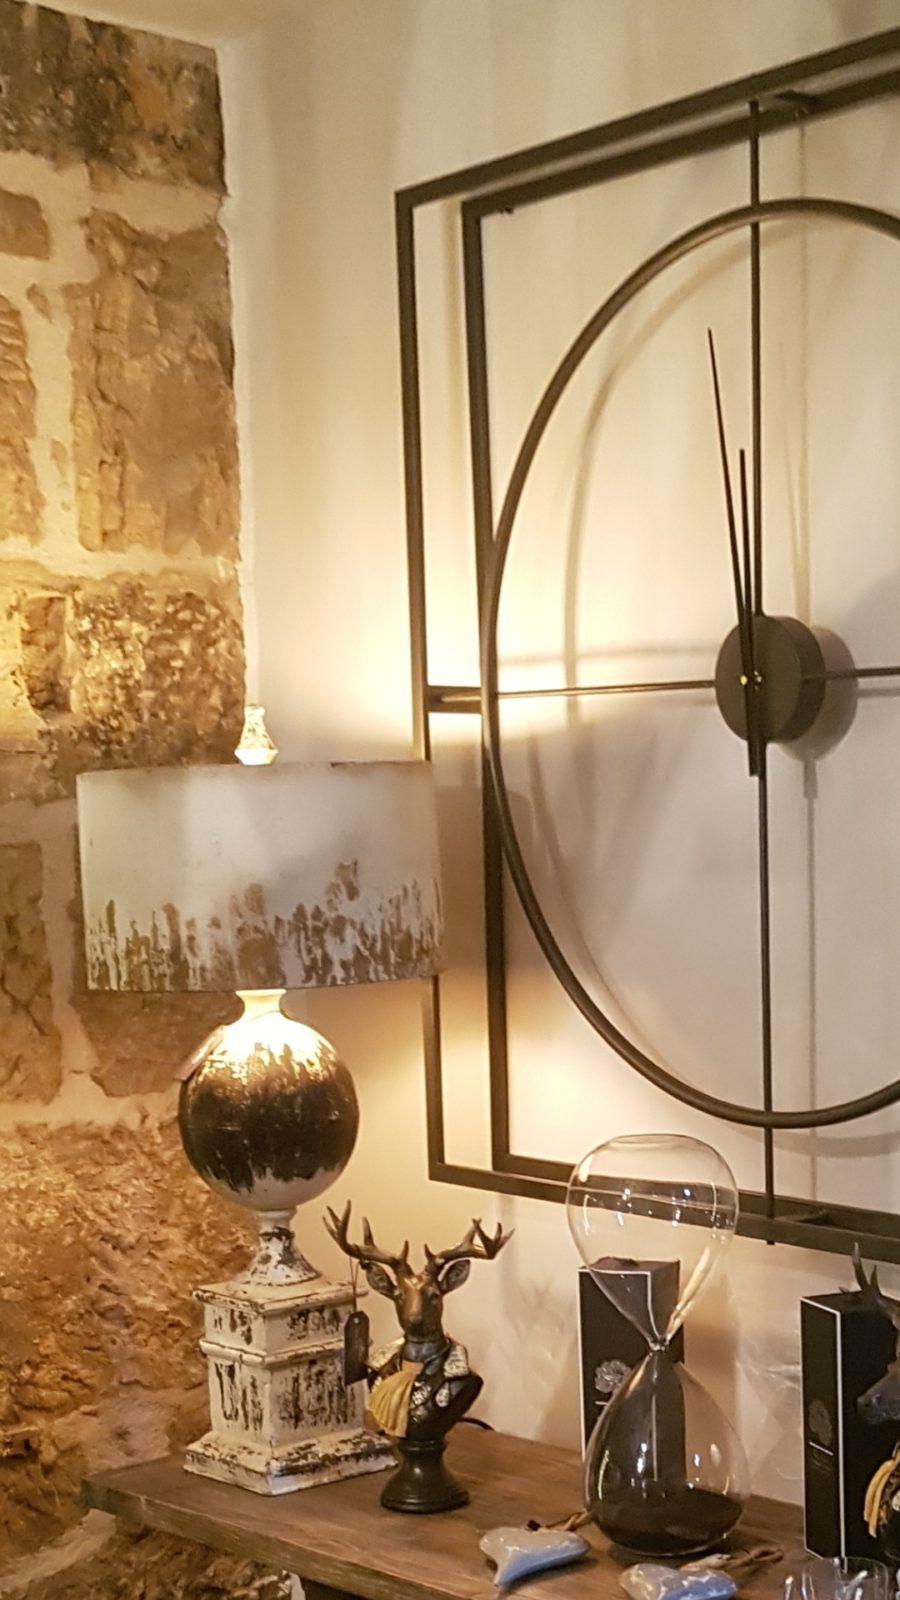 Lamps & Clock